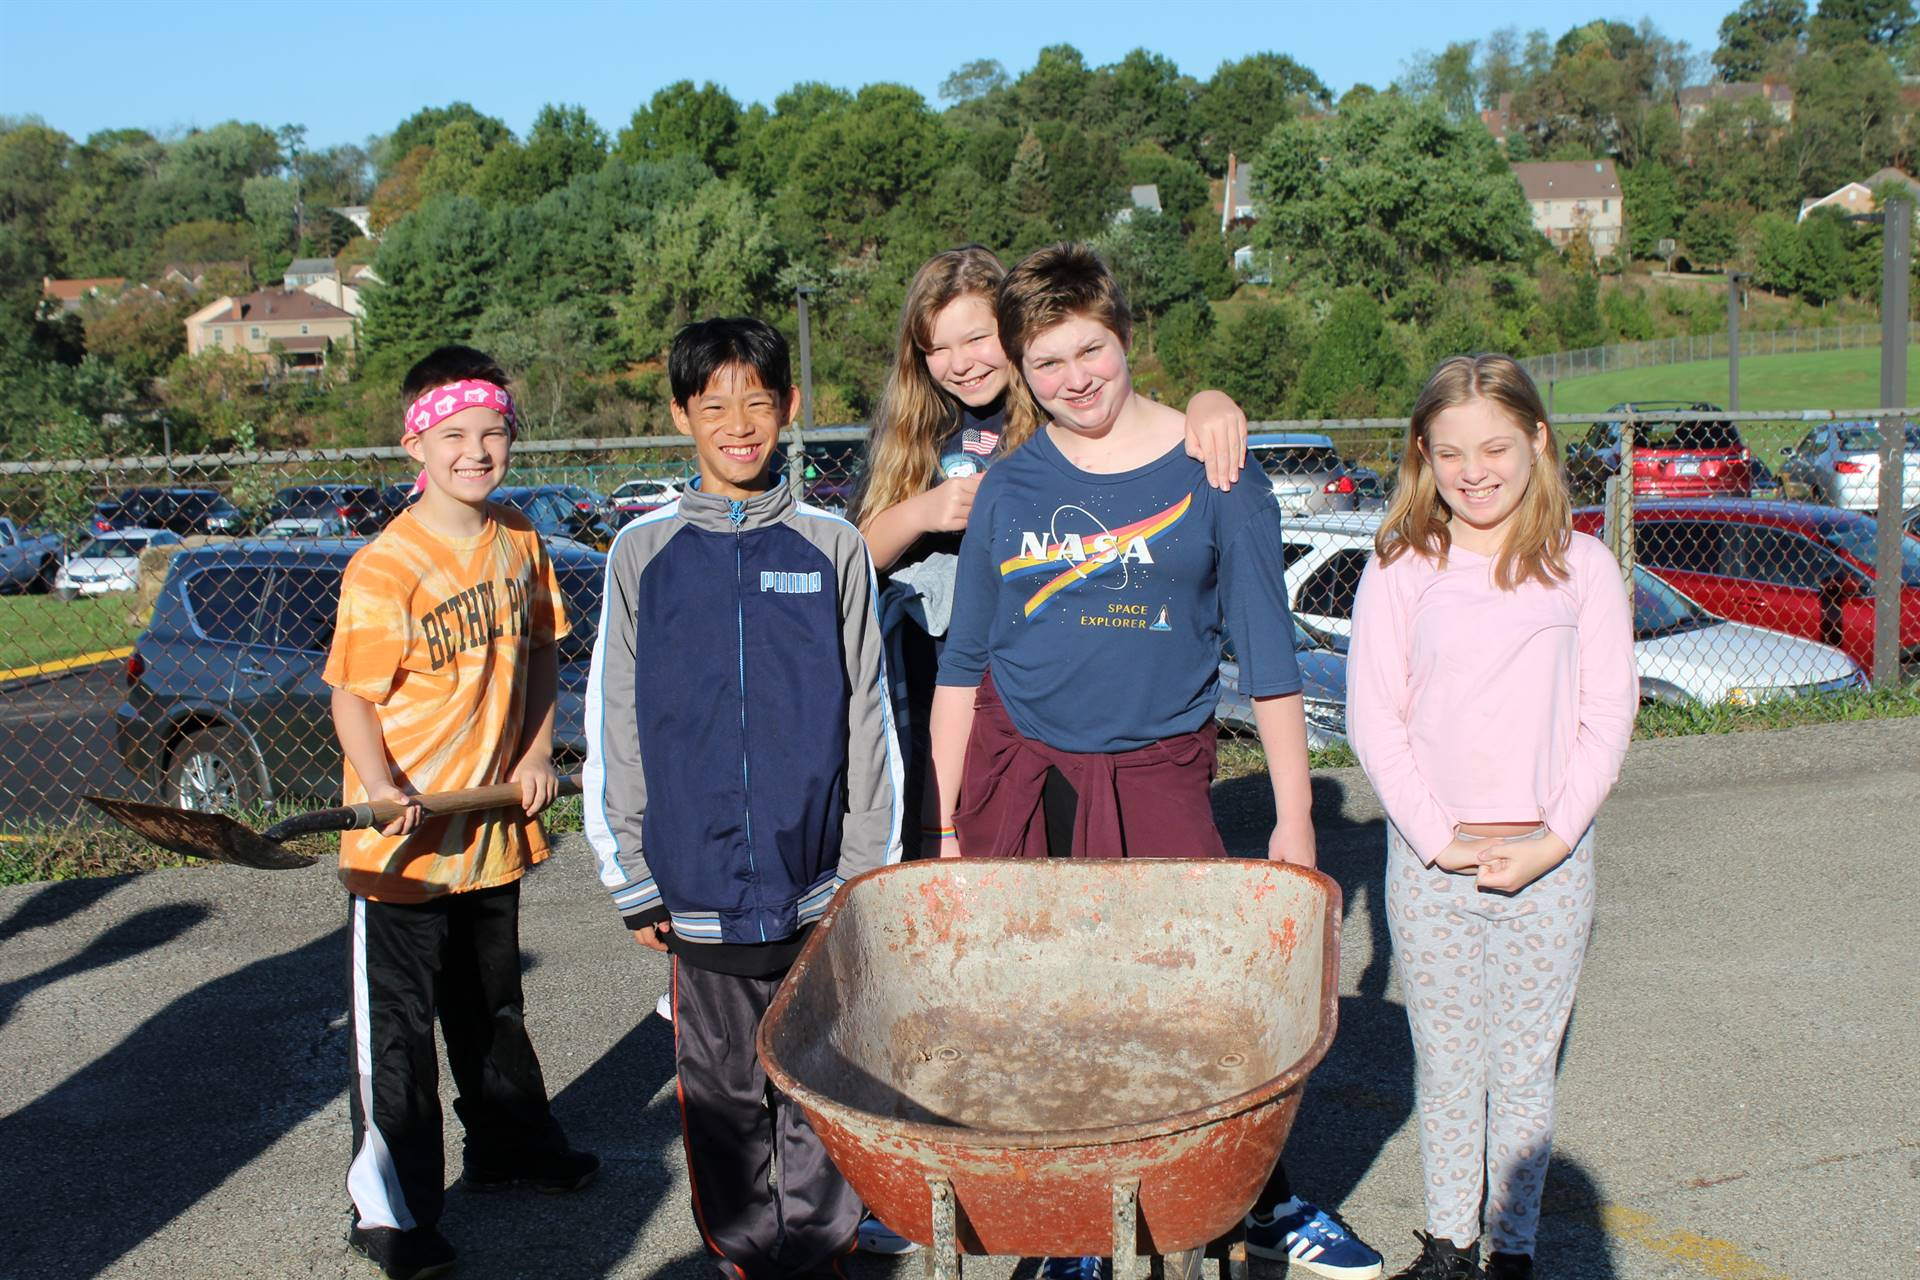 Students gathered around an empty wheelbarrow